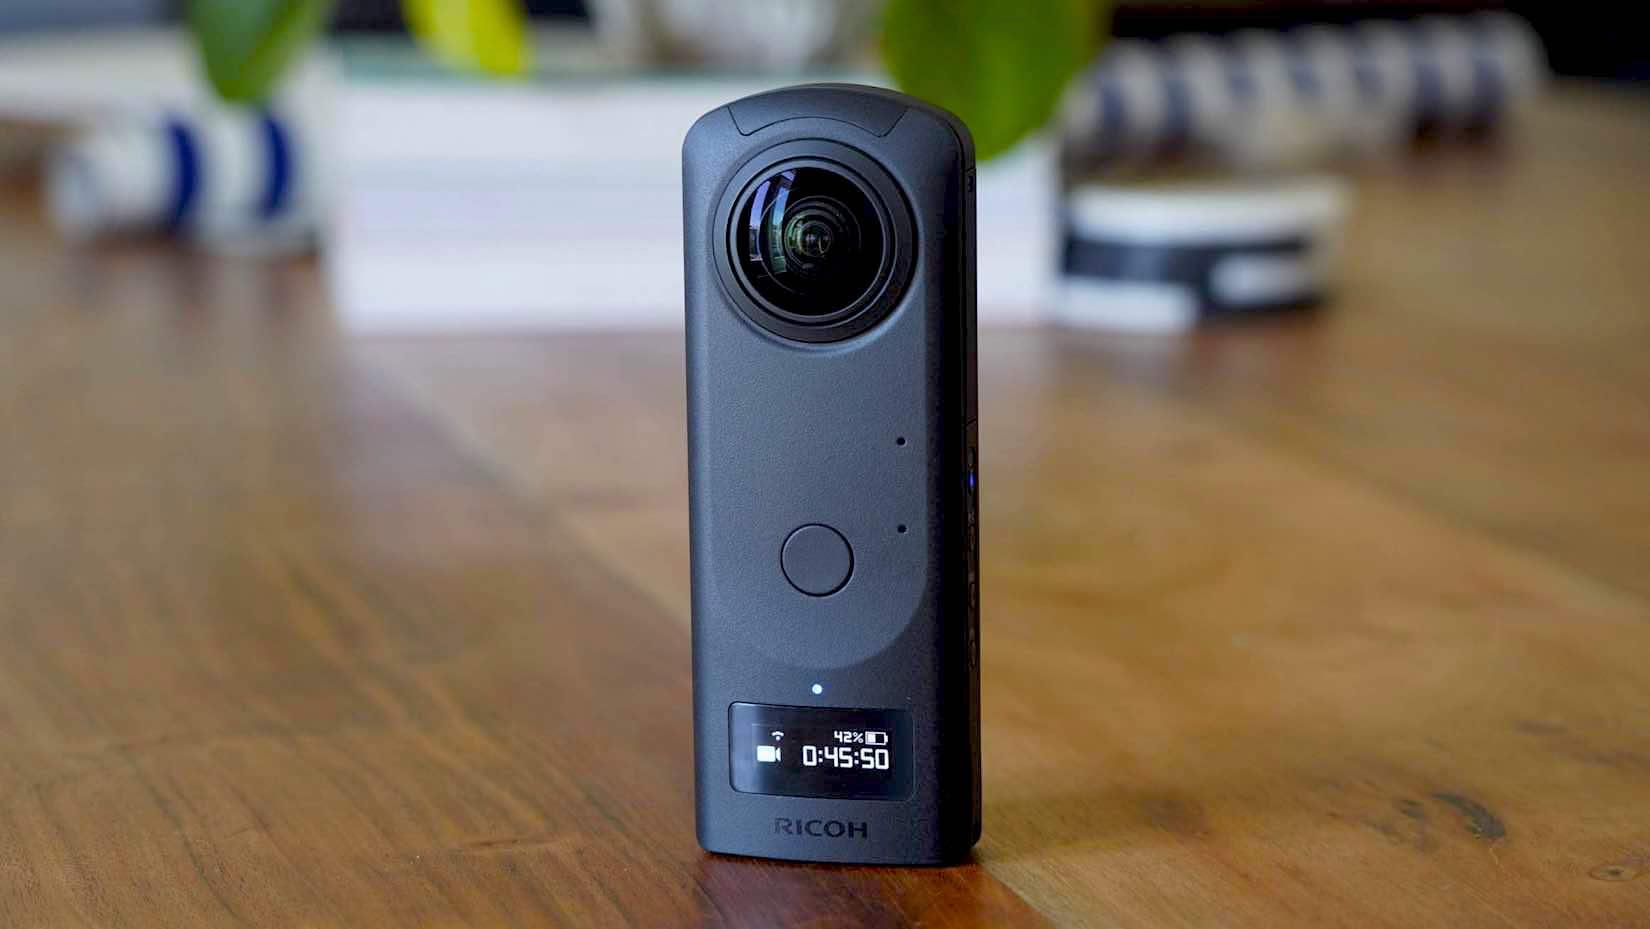 Theta Z1 de Ricoh se suma a nuestro inventario de cámaras 360°